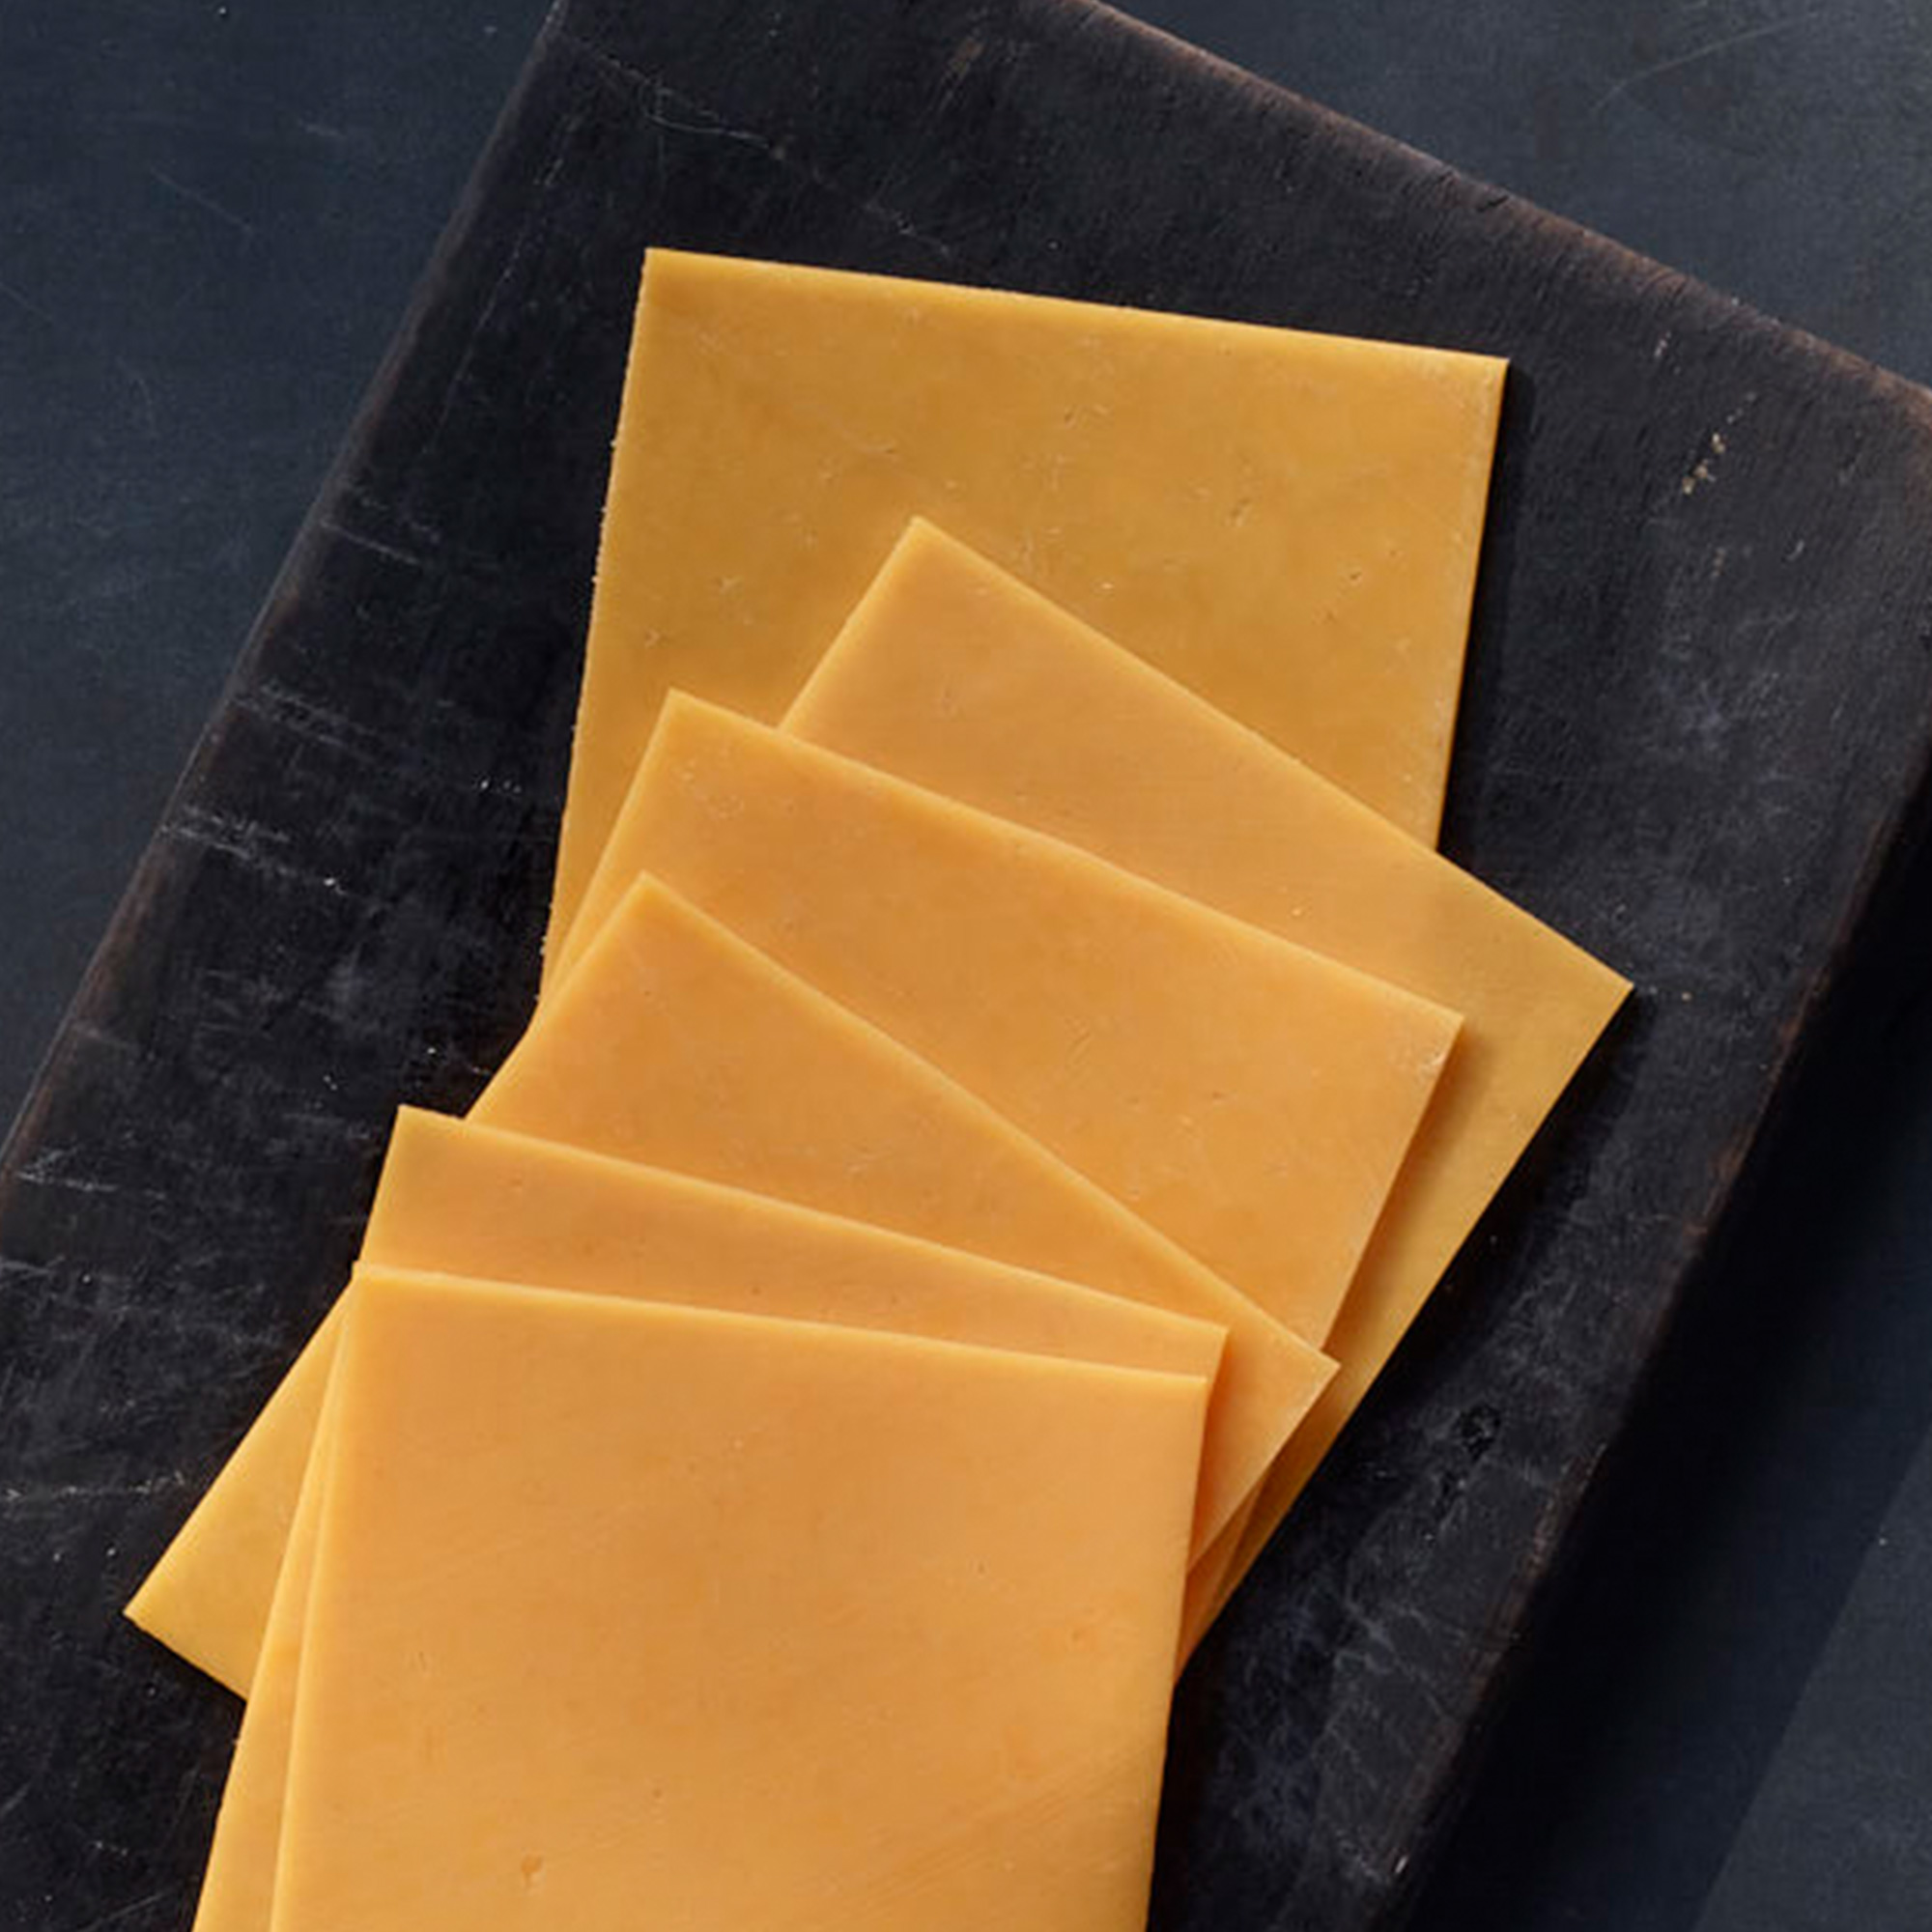 Sargento® Sliced Reduced Fat Medium Natural Cheddar Cheese